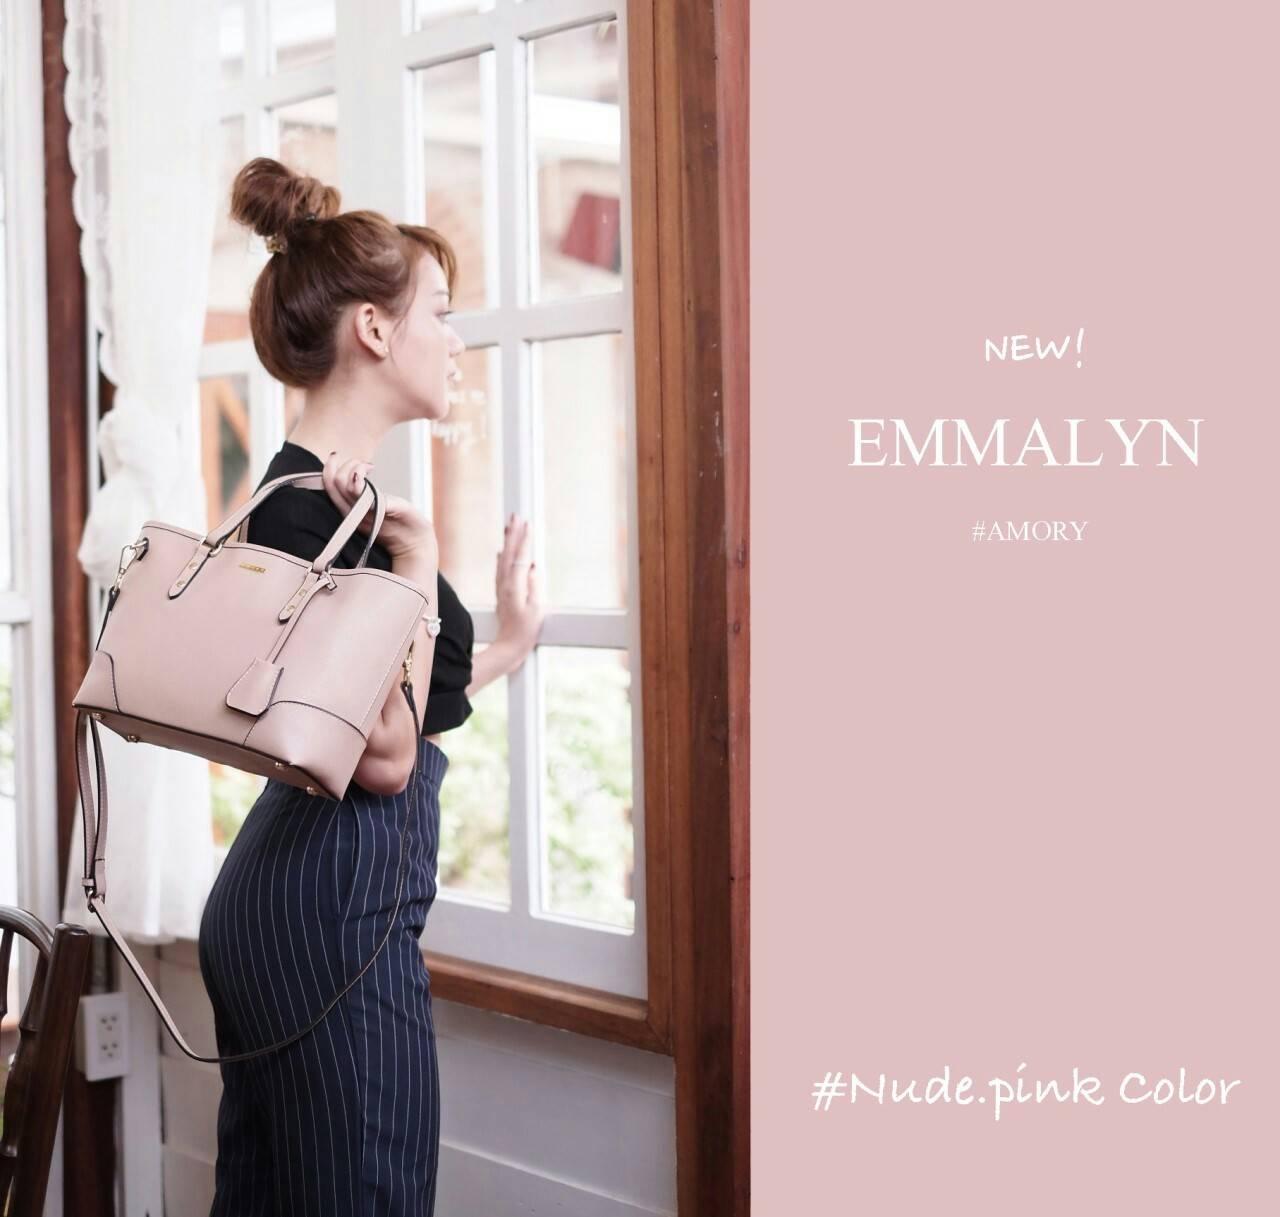 Amory Emmalyn Shopping Bag 2018 หนังแท้ สินค้าแท้จาก shop ออเจ้าห้ามพลาดโดยเด็ดขาดนะเจ้าค่ะ